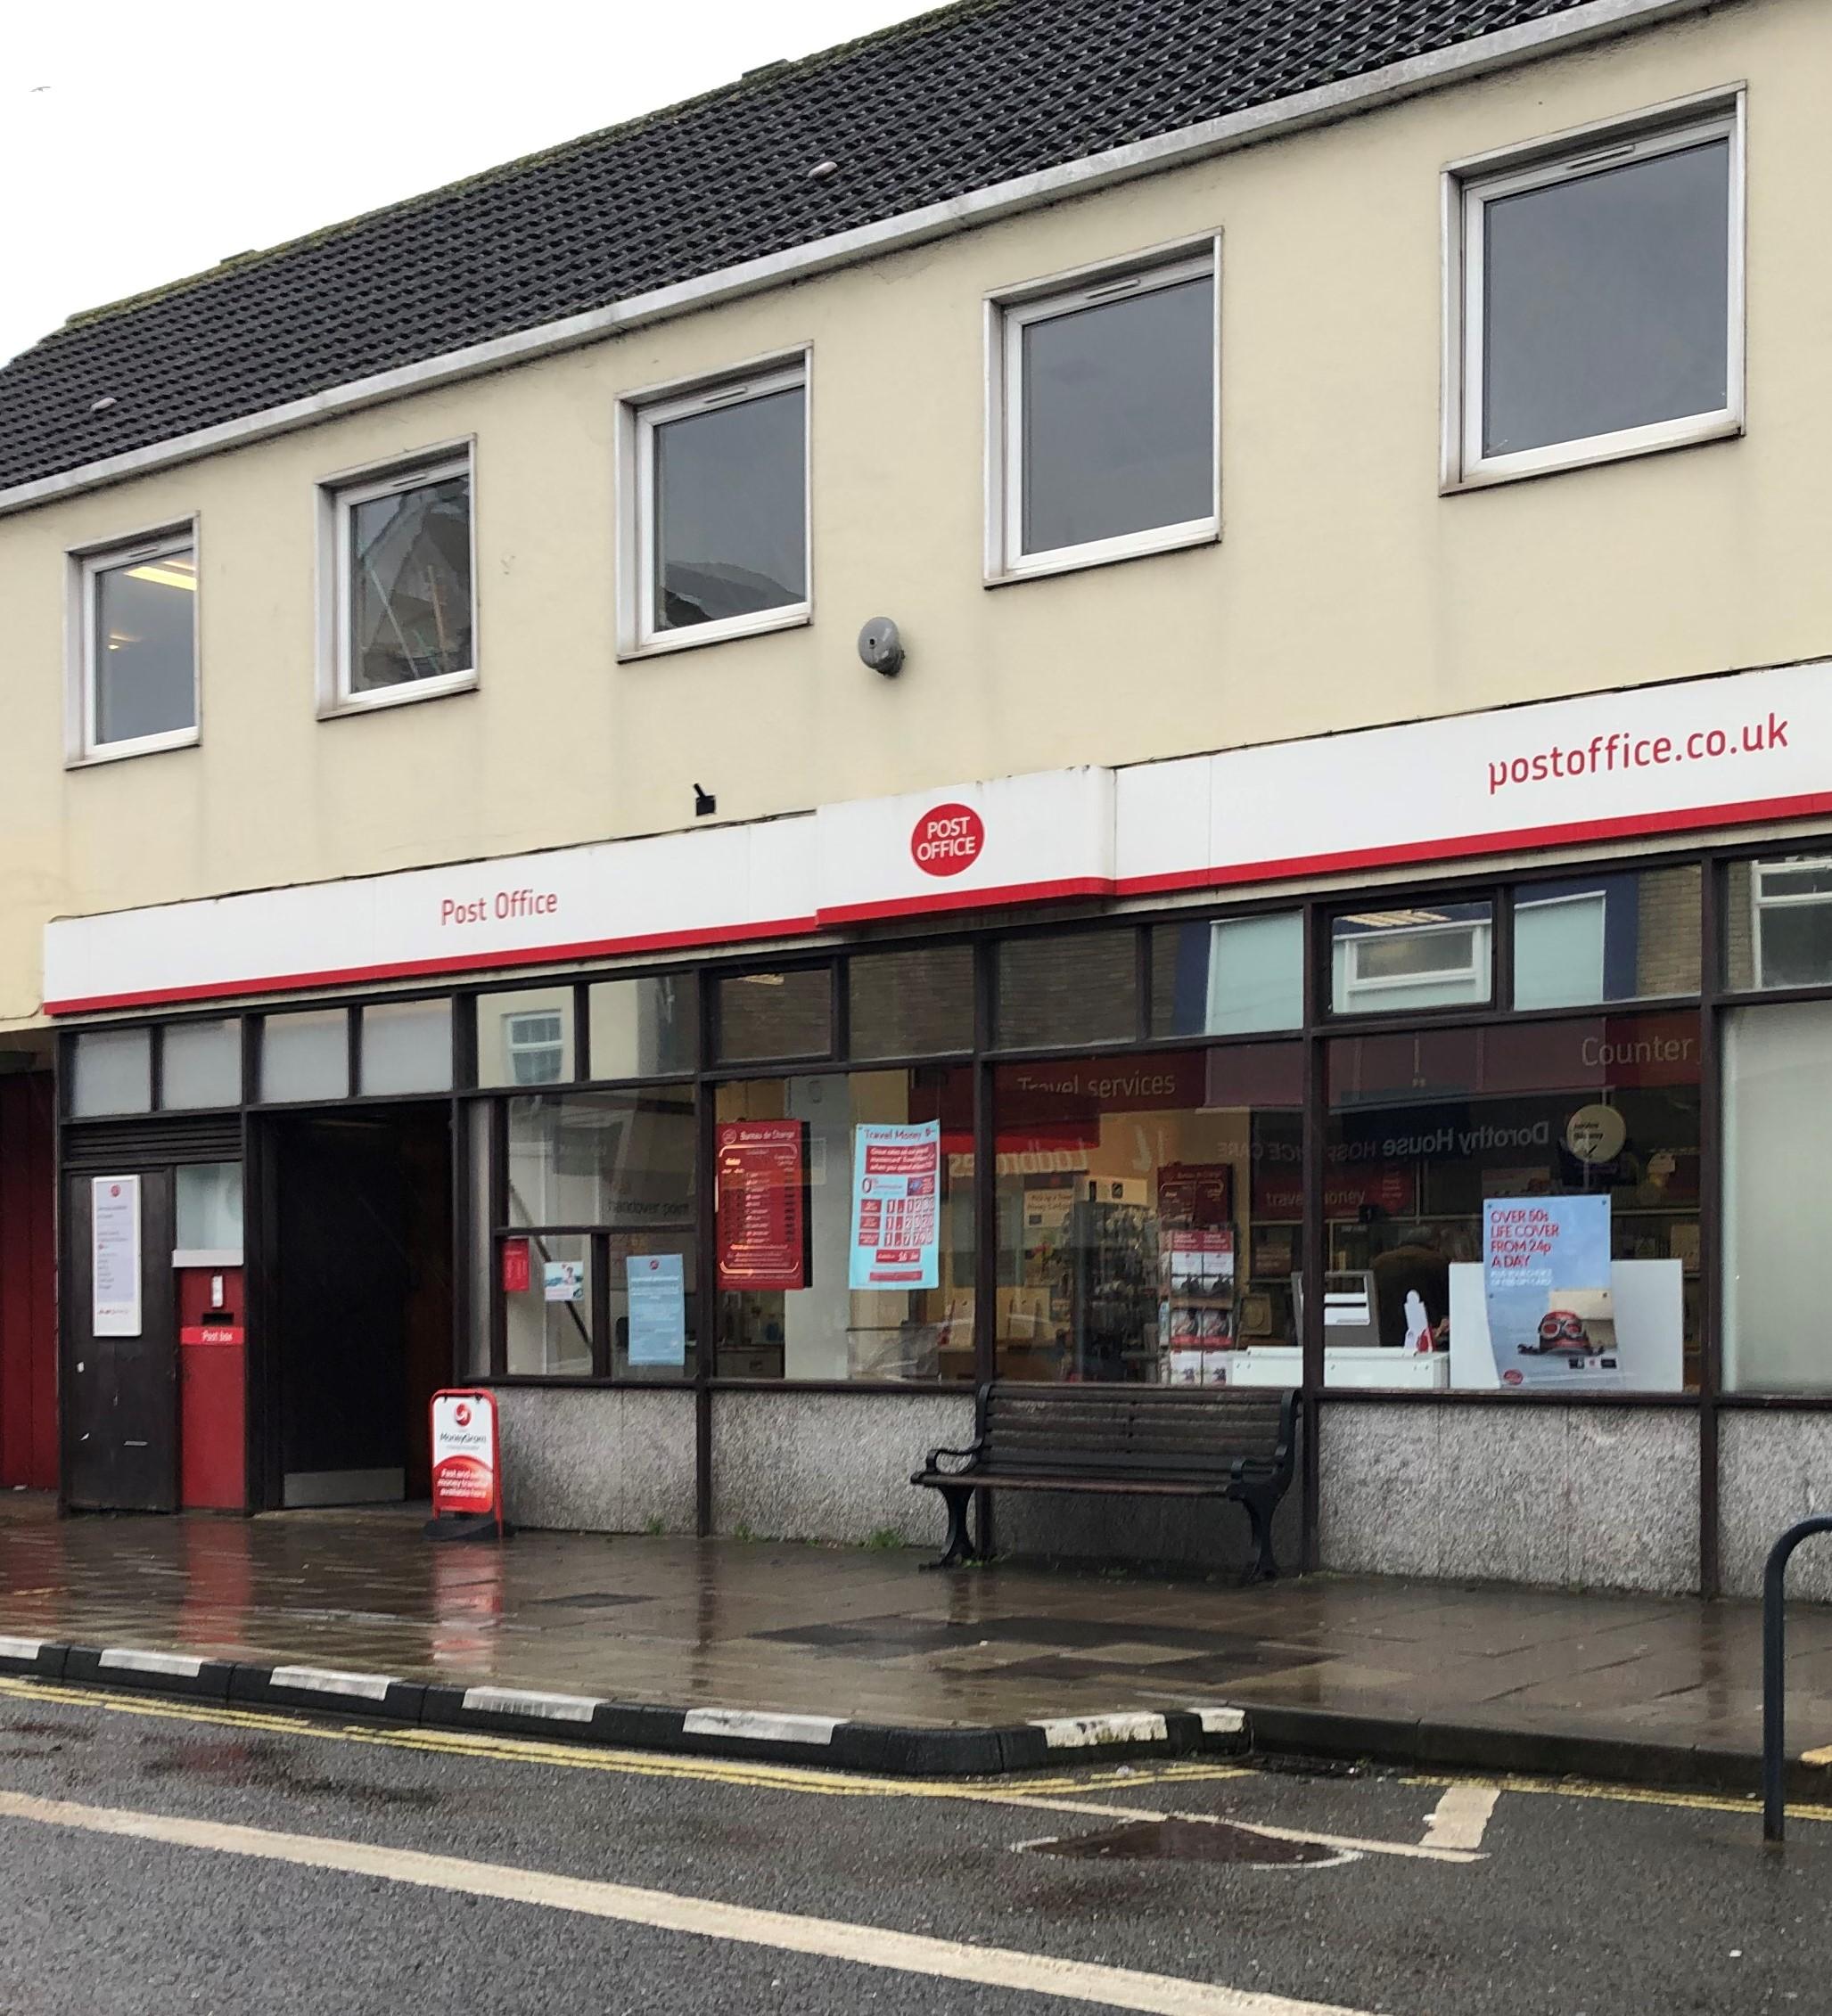 Shock At 'privatisation' Of Keynsham Post Office